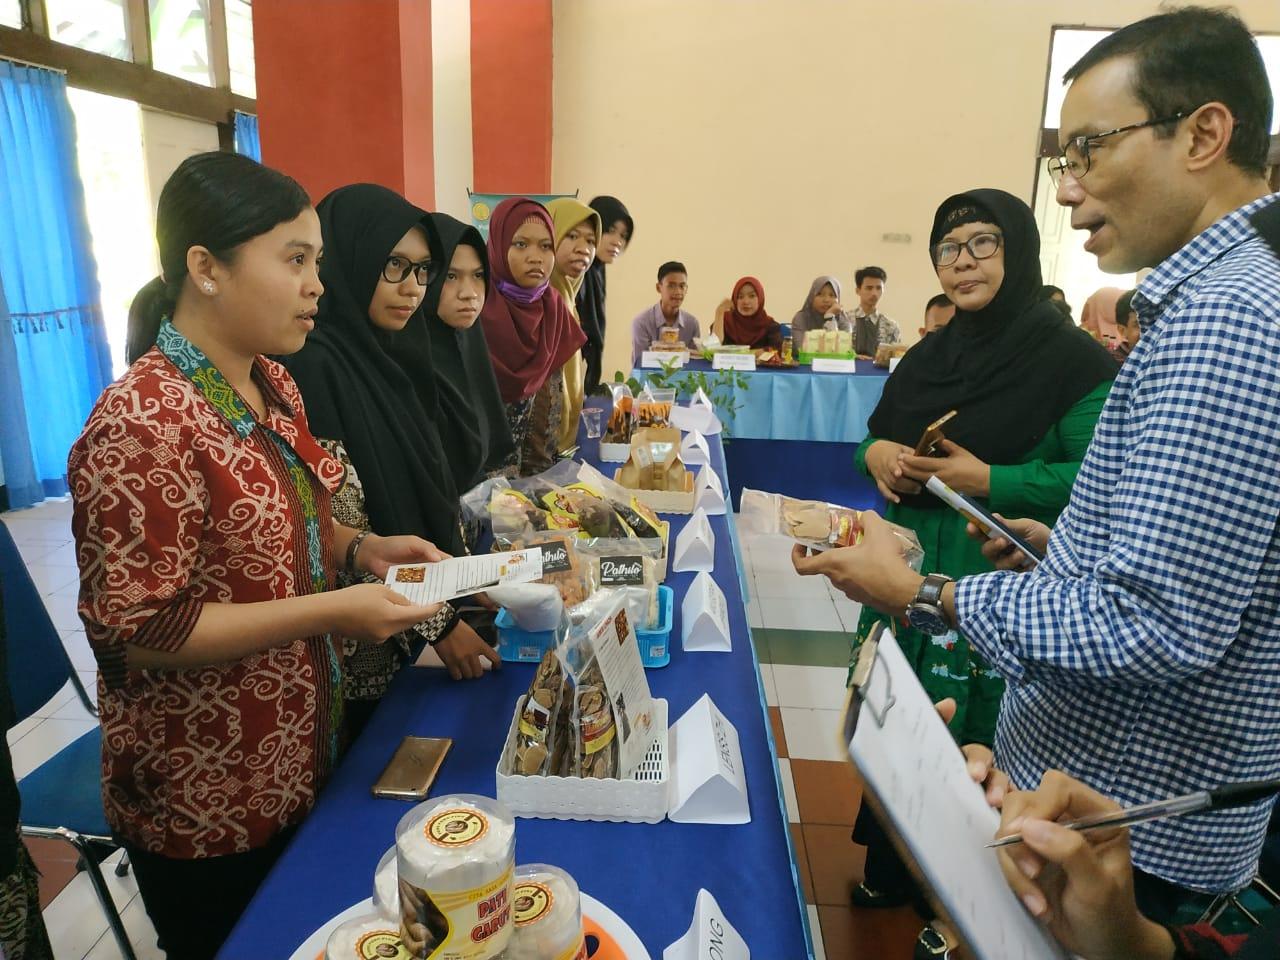 Founder Pak Tani Digital Mahendra Sitepu Mengunjungi Stand di Polbangtan Yogyakarta